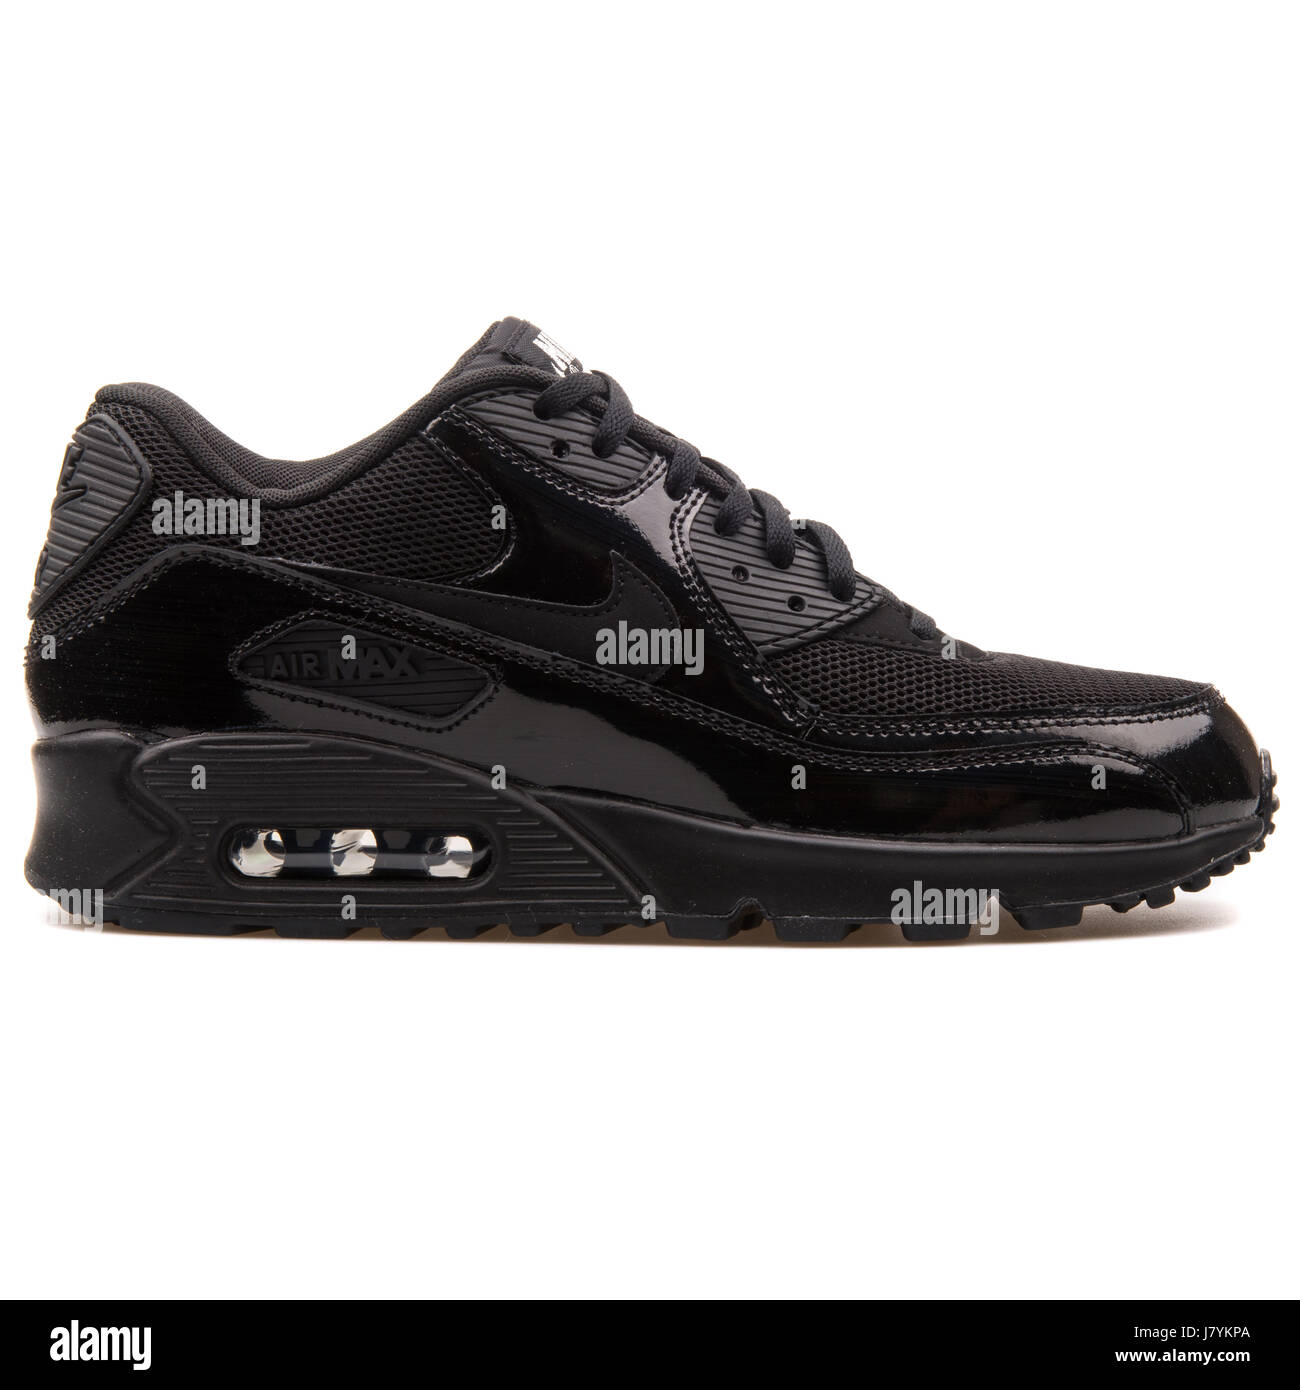 Halber Preis Nike Air Max 90 Damen Blumen WJJ833